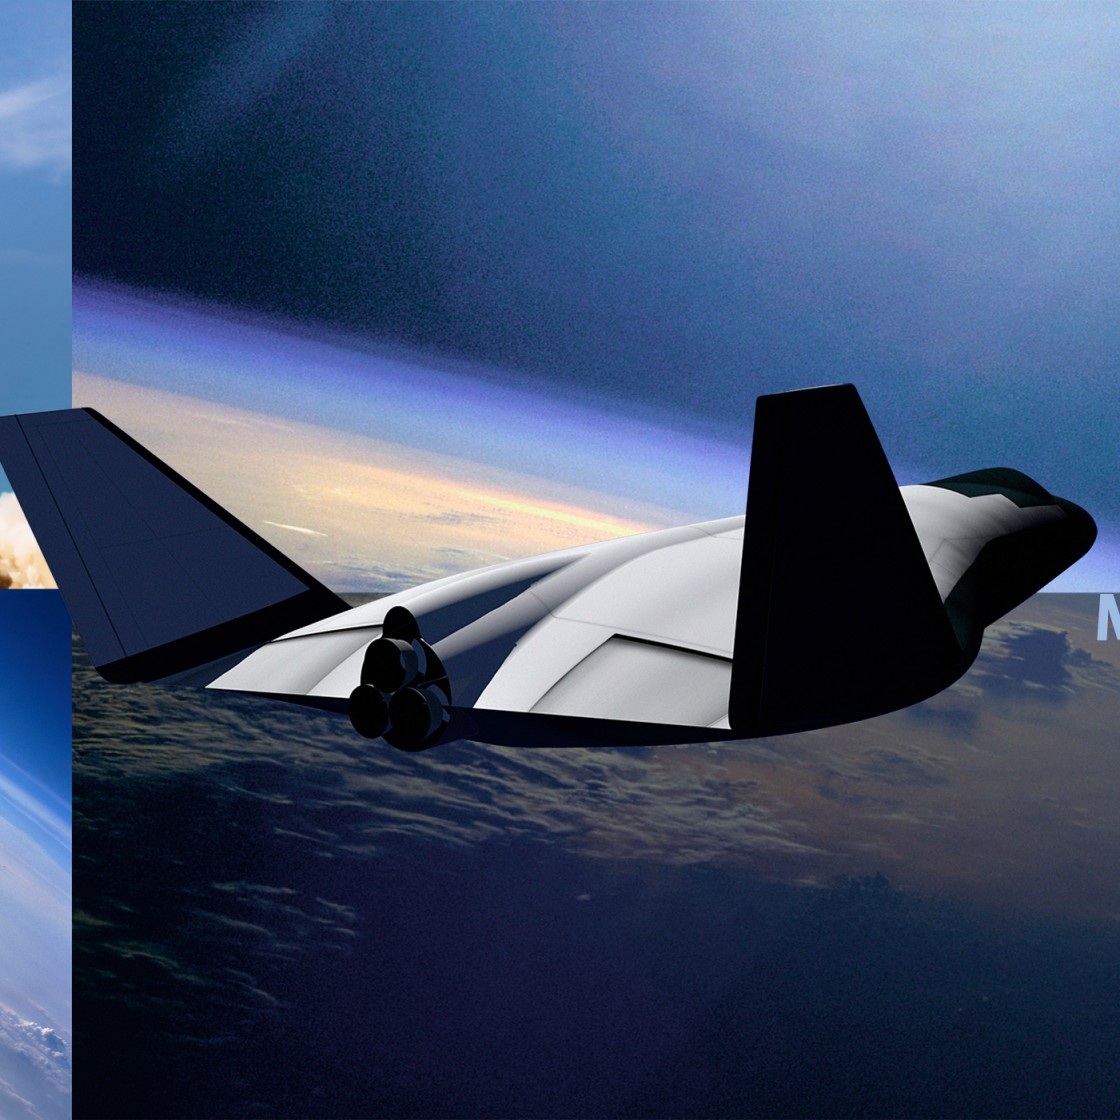 Mustard Space shuttle